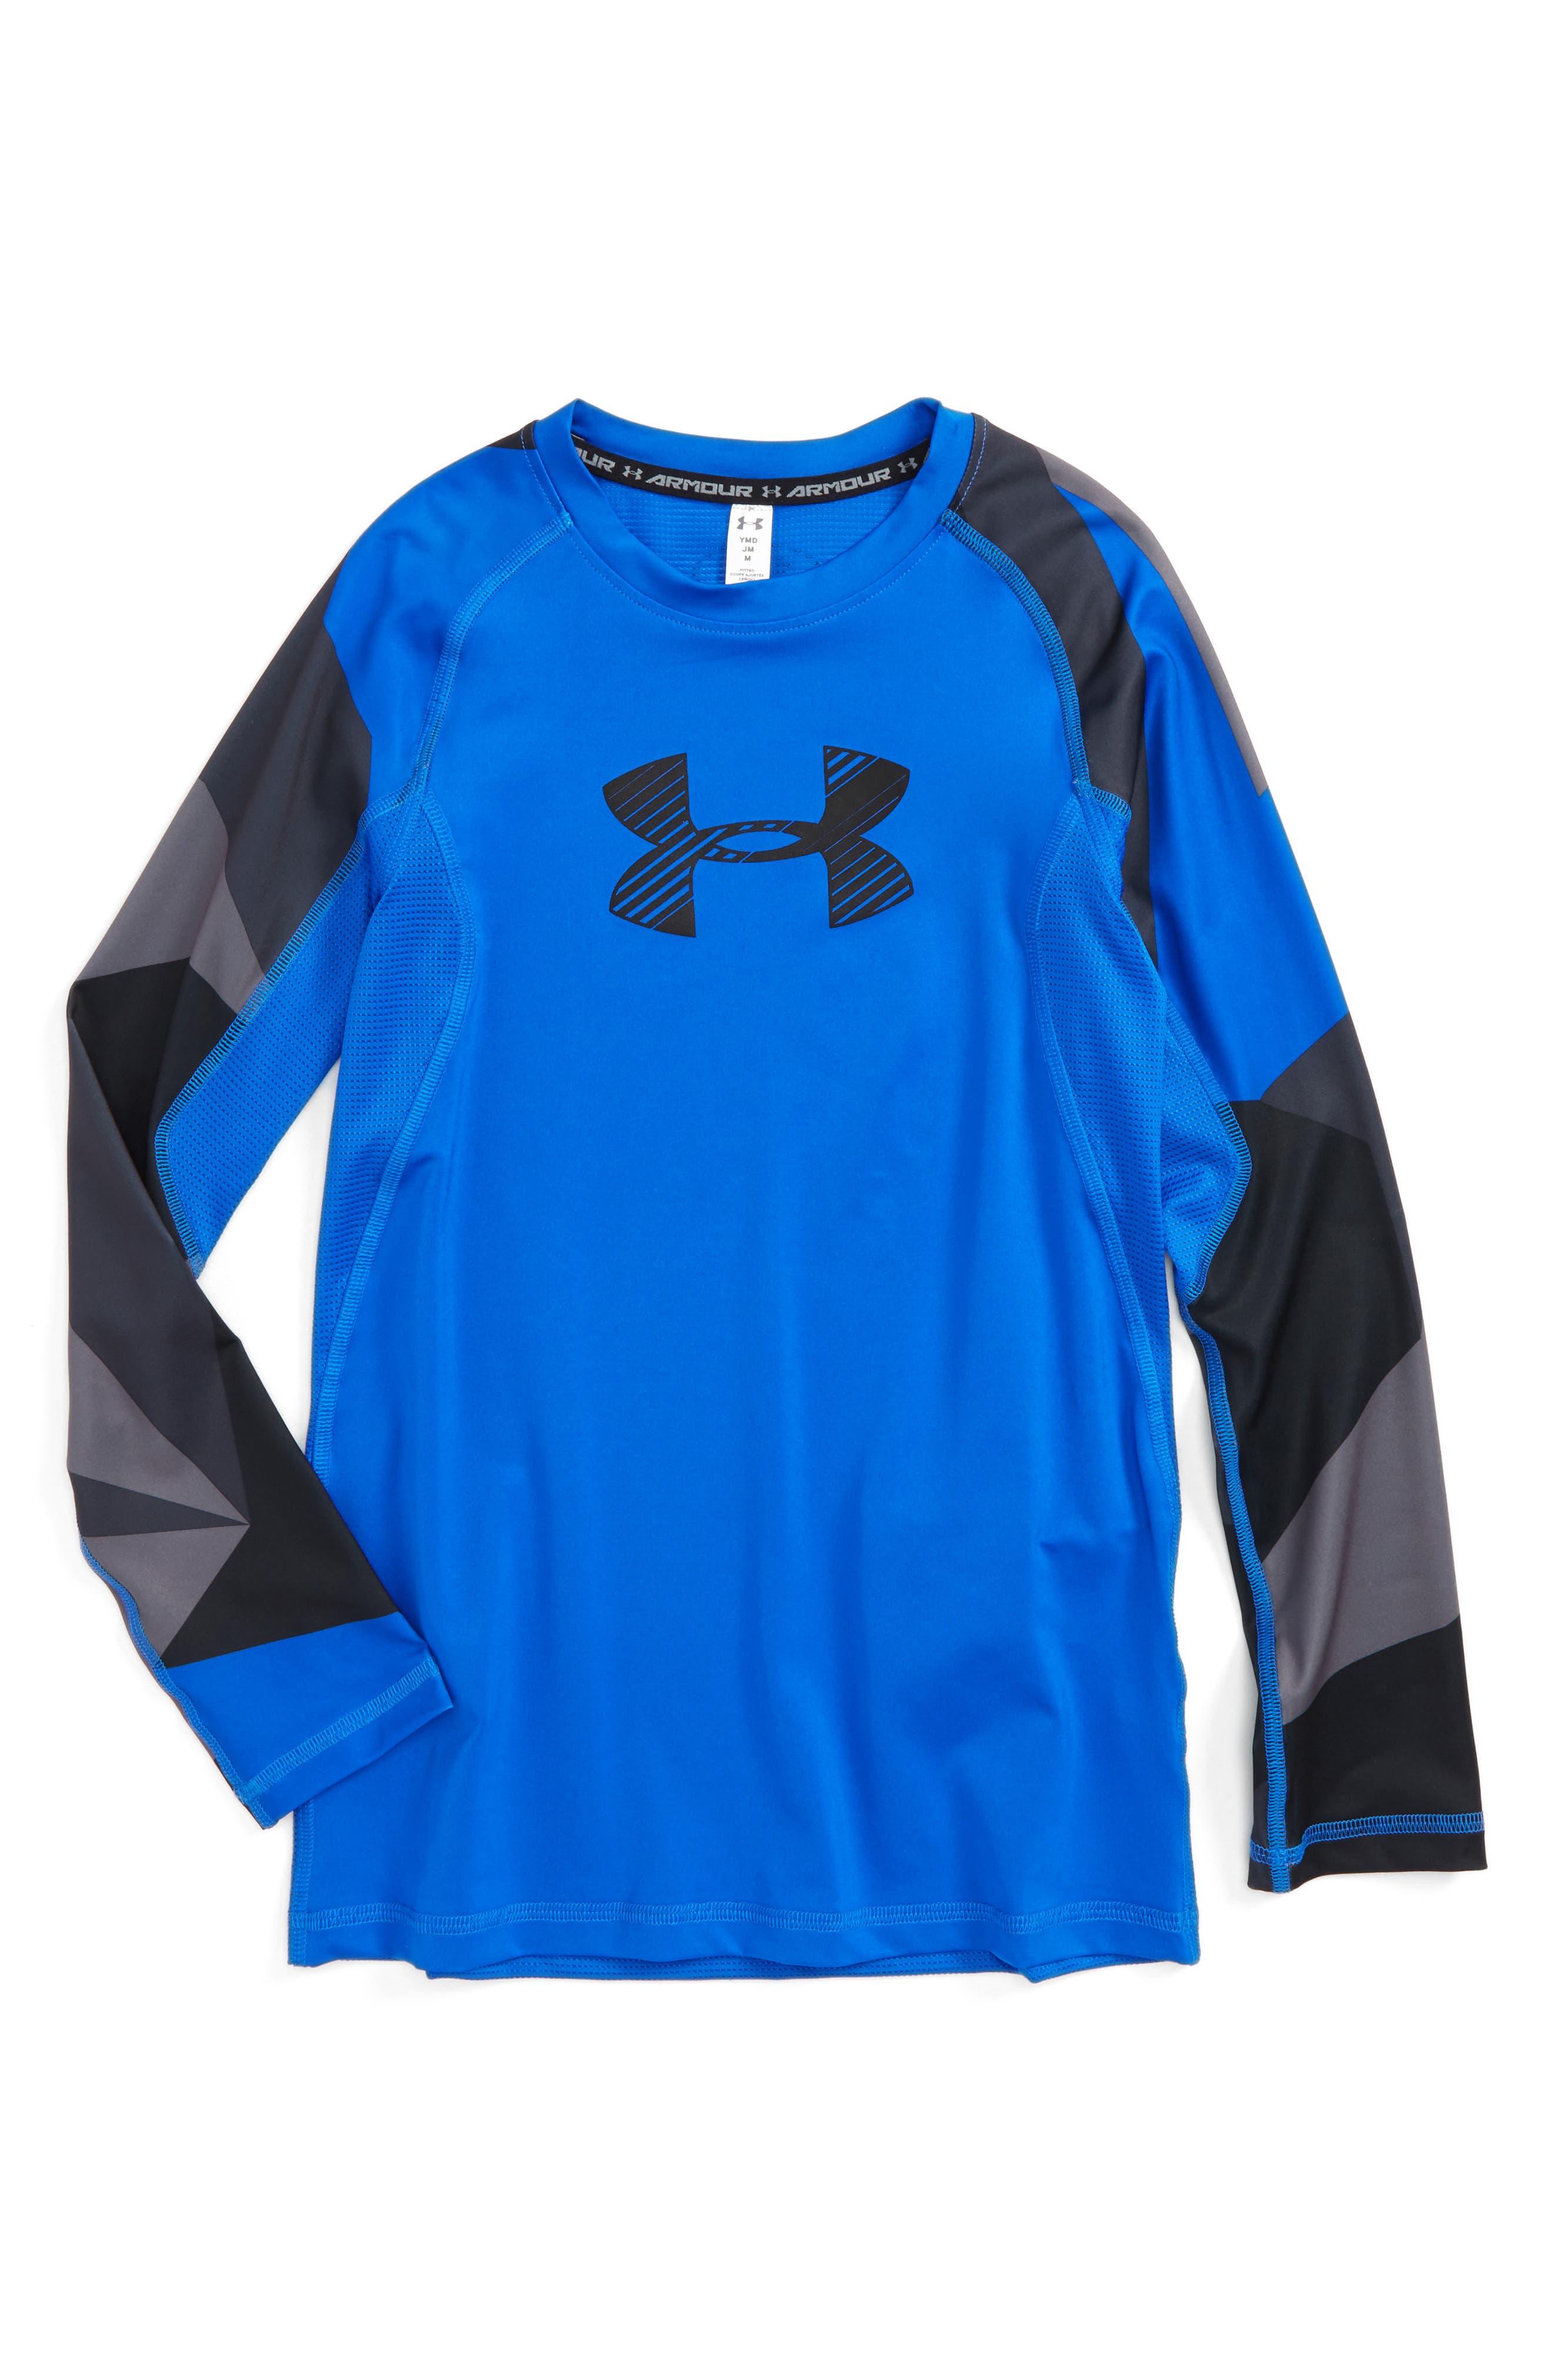 Novelty HeatGear<sup>®</sup> Shirt,                         Main,                         color, Ultra Blue/ Black